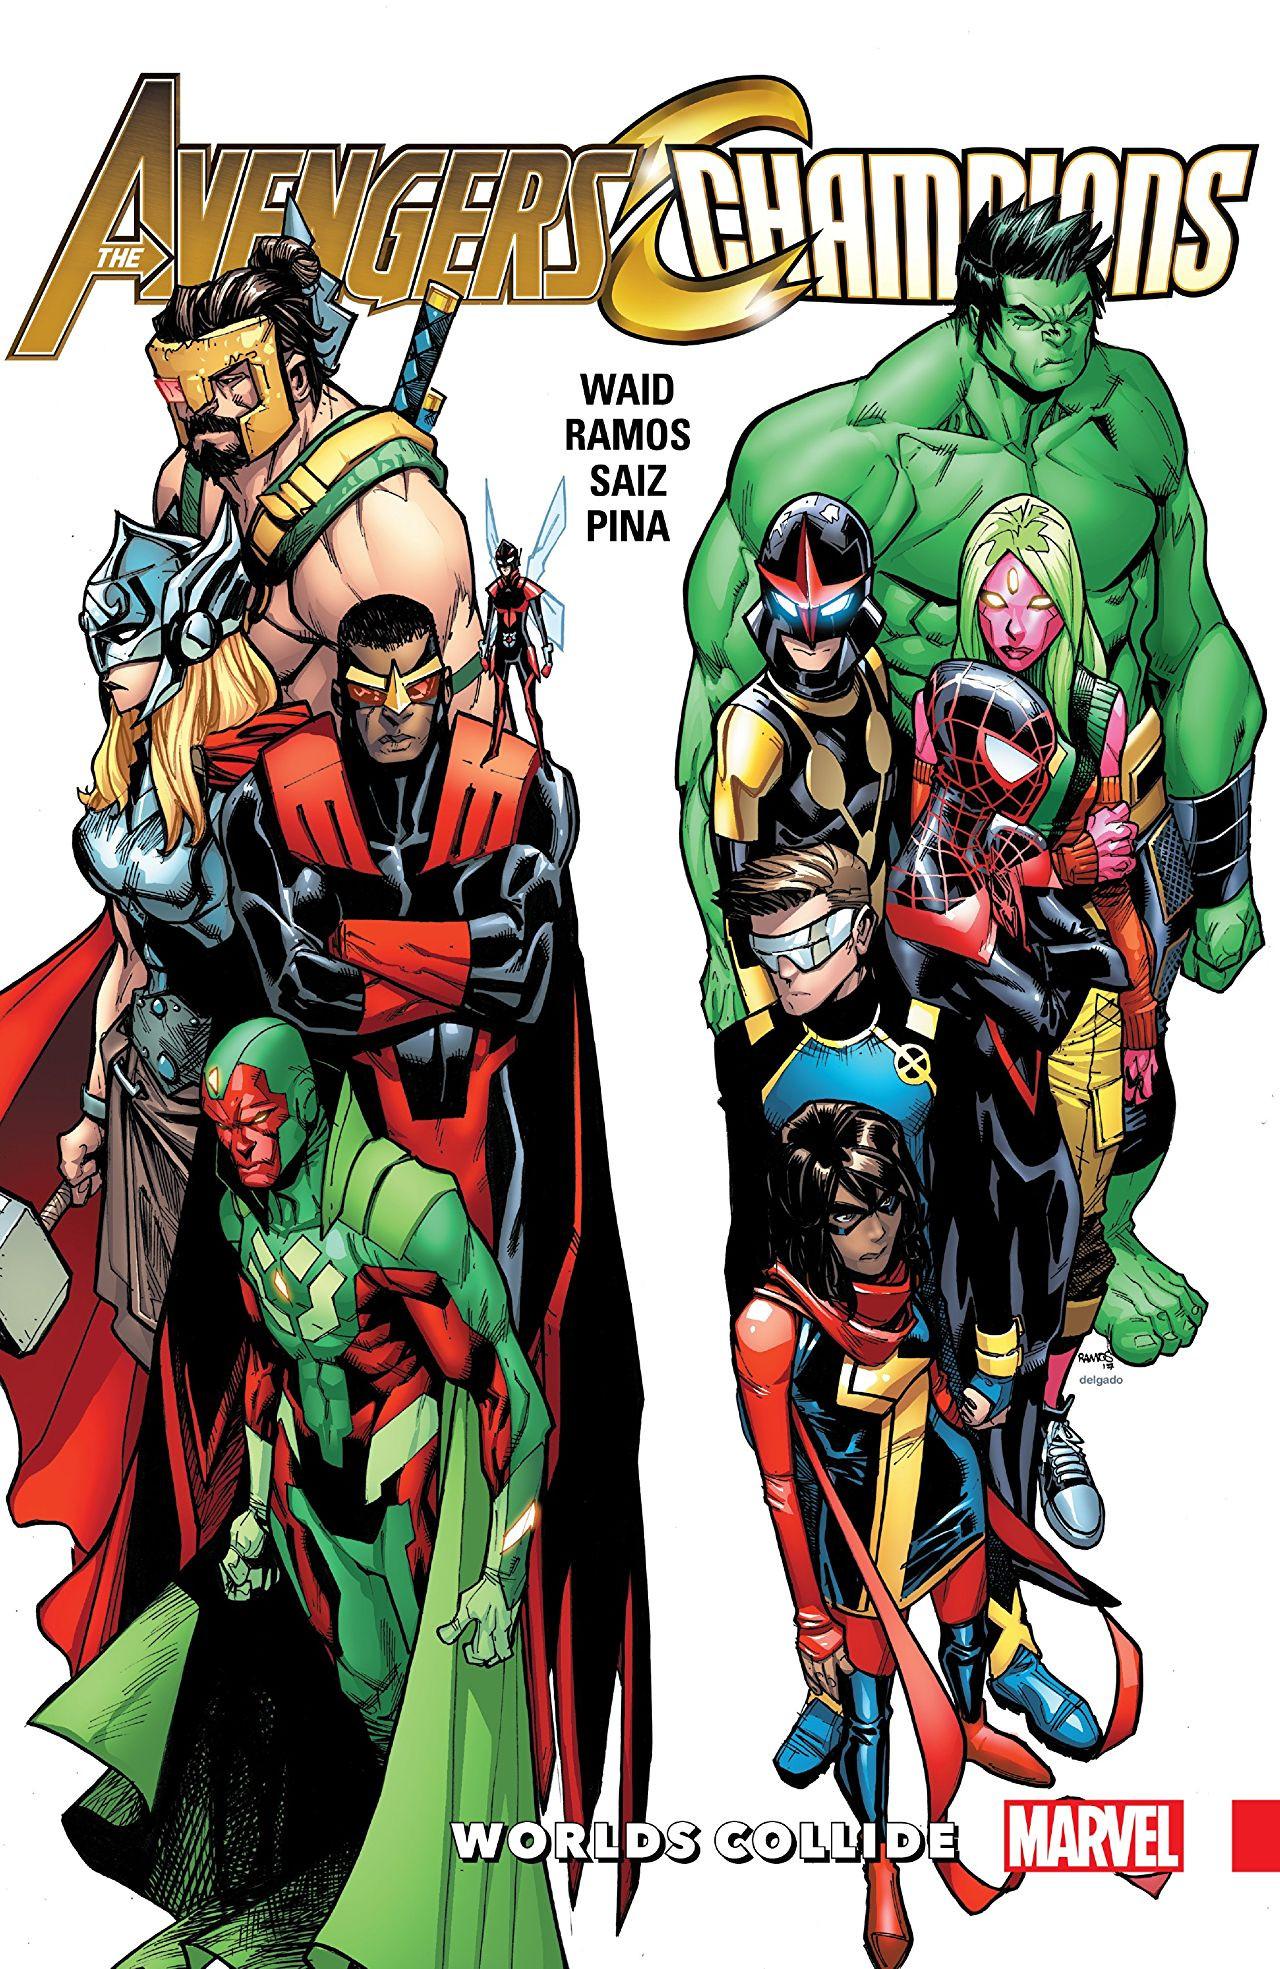 Avengers & Champions Worlds Collide TPB Vol 1 1.jpg